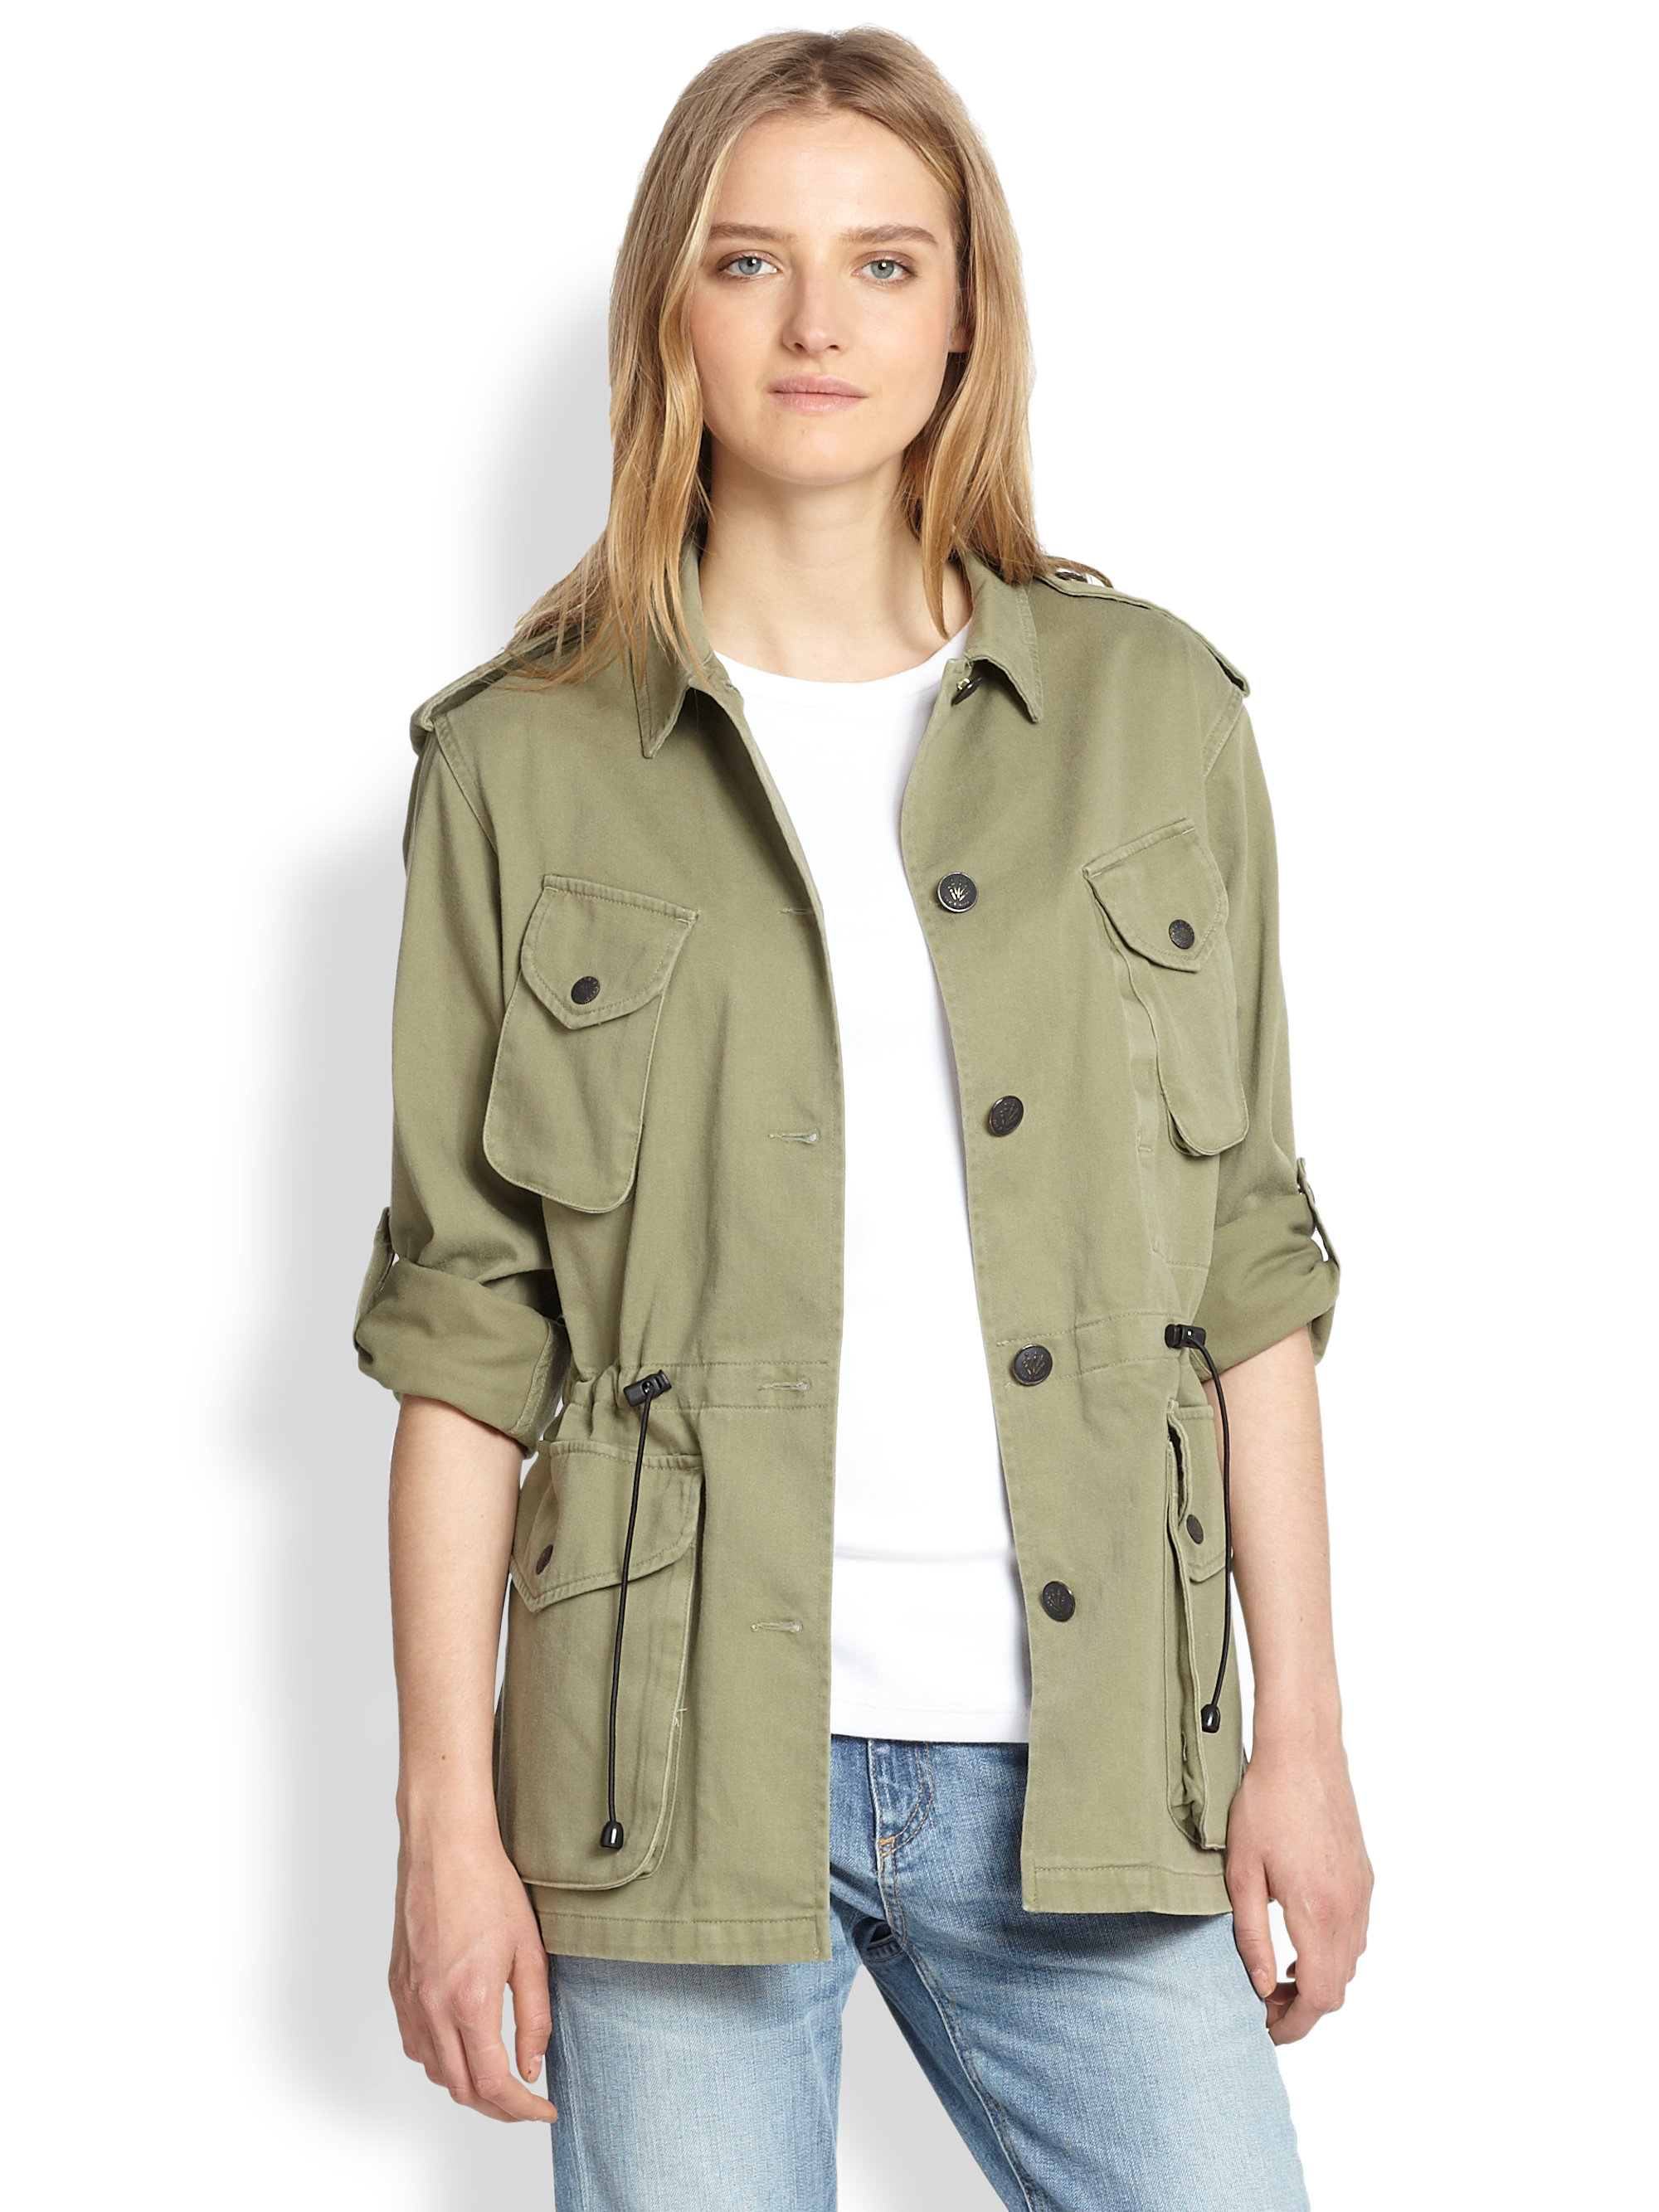 Utility Jacket Jackets And Nike: Rag & Bone Ohara Utility Jacket In Green